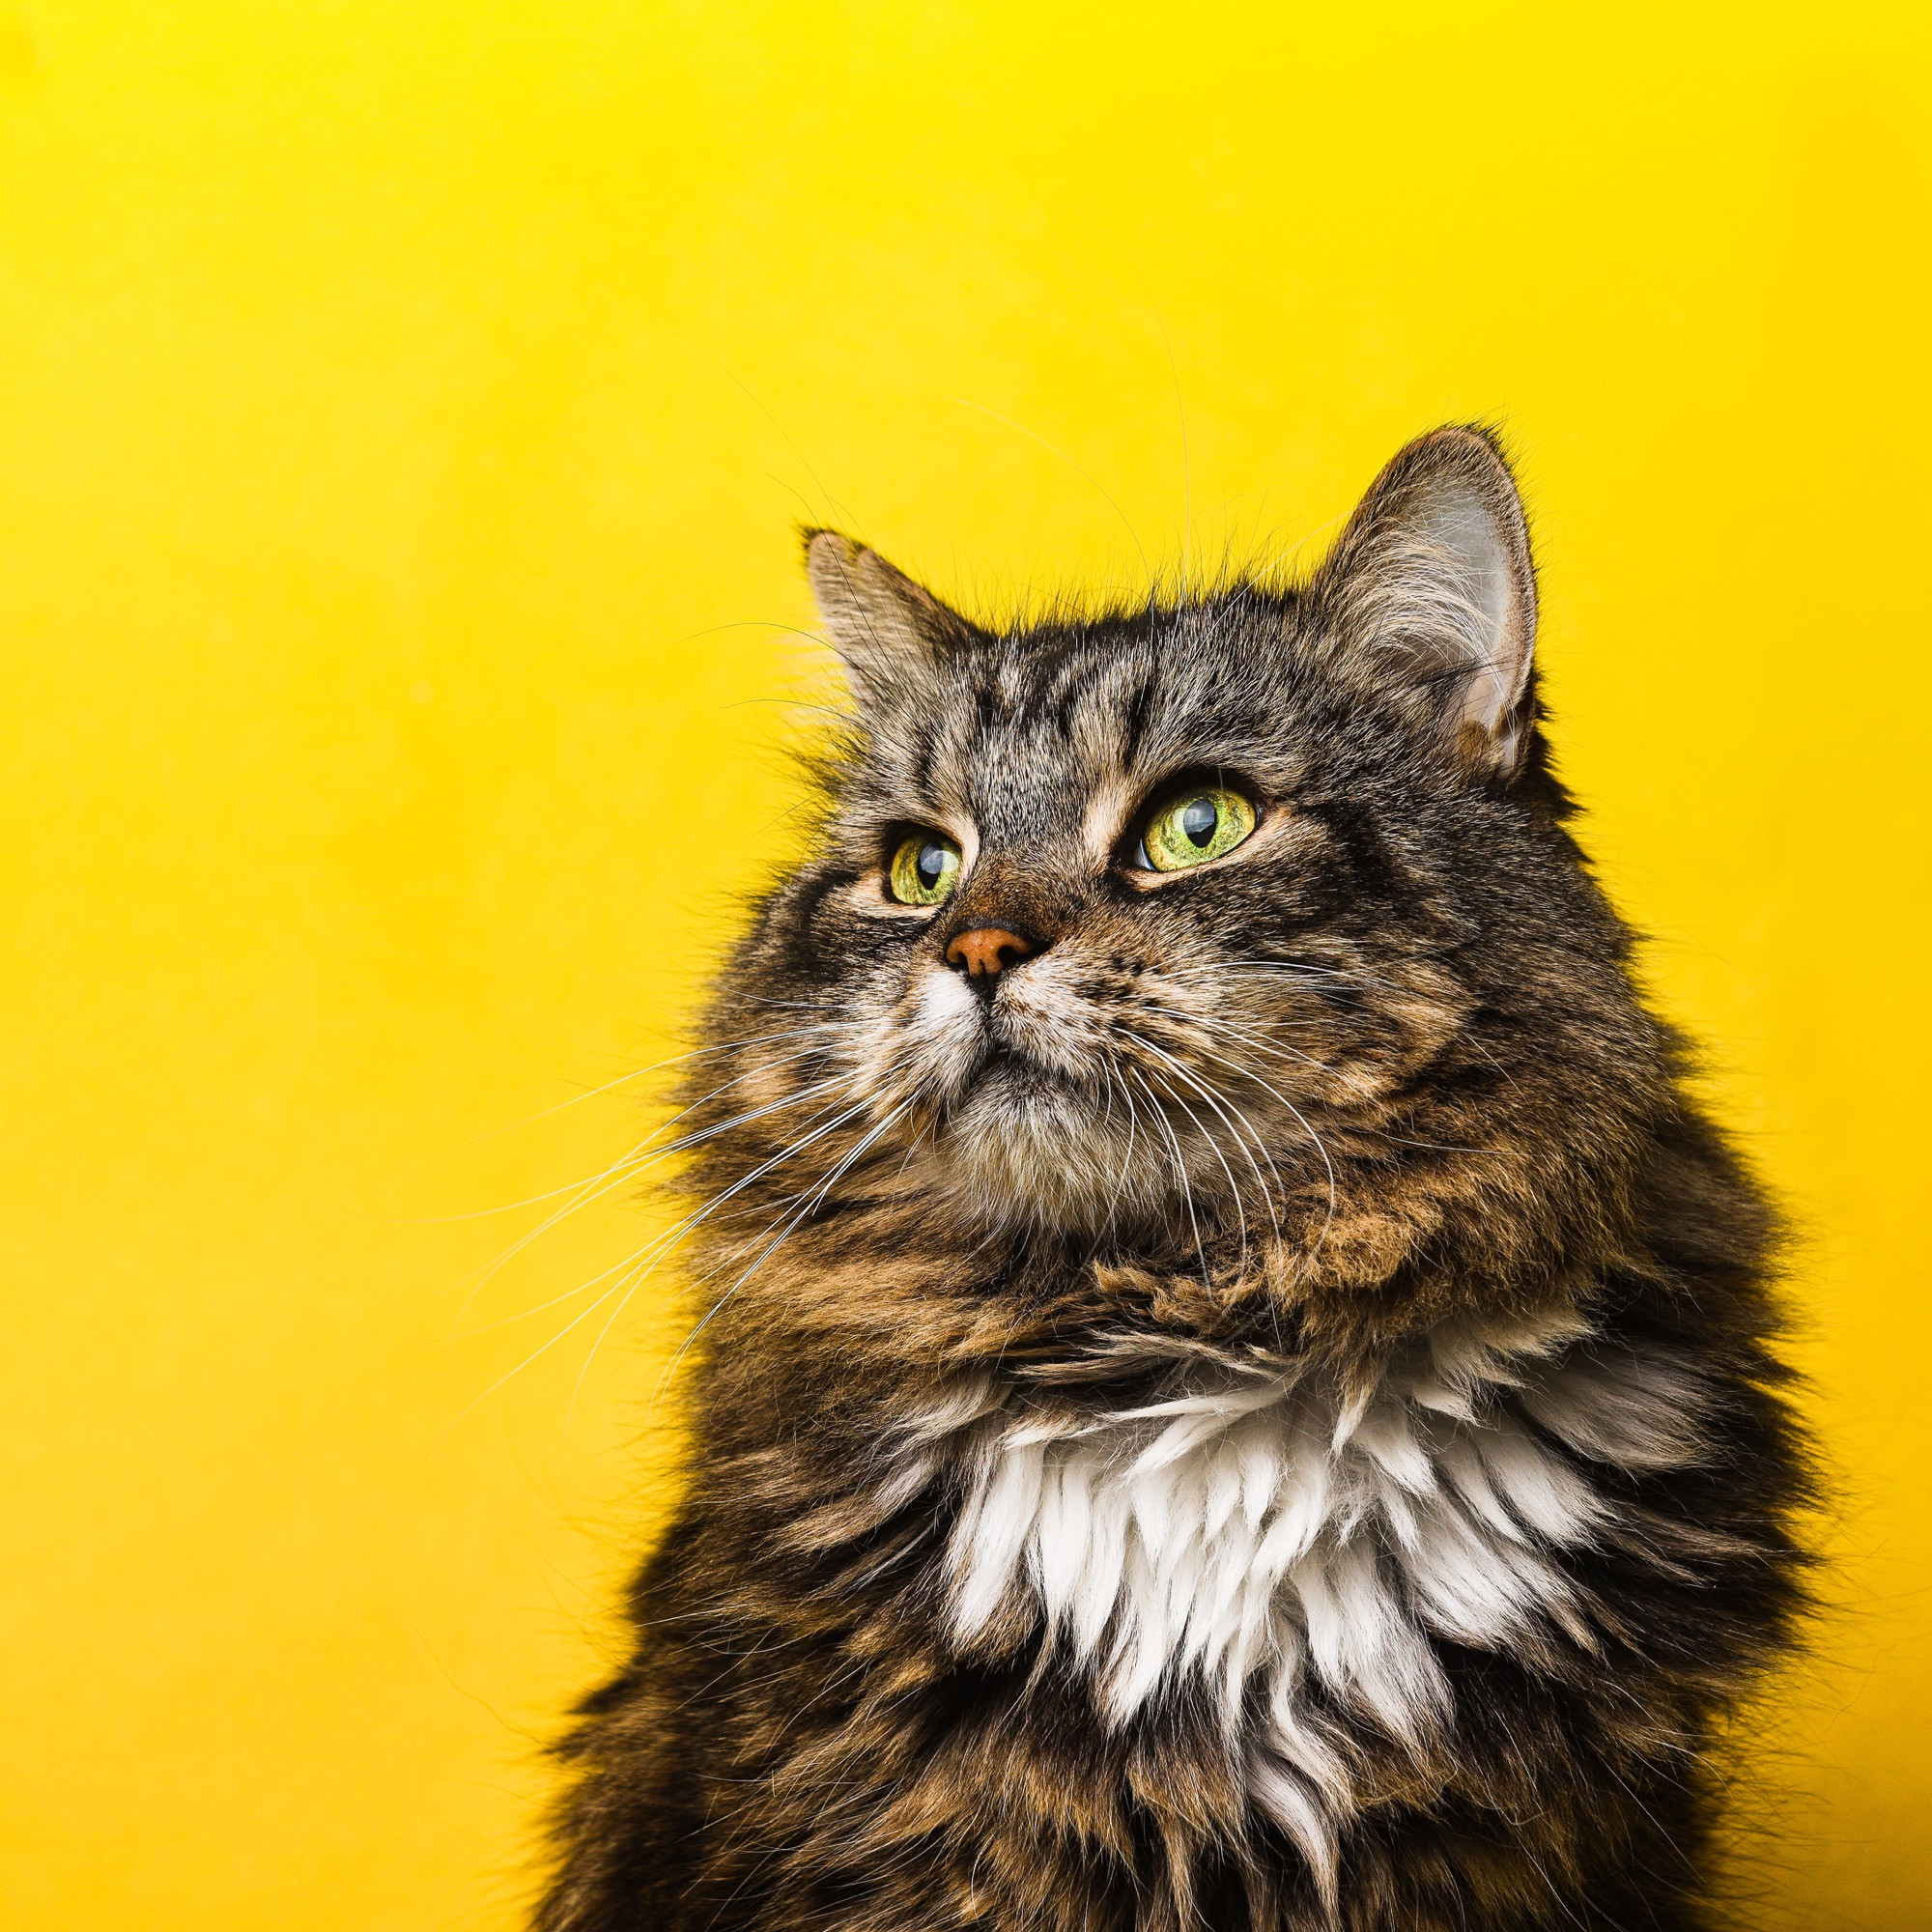 Add-On Pet Portrait Session (In Studio)